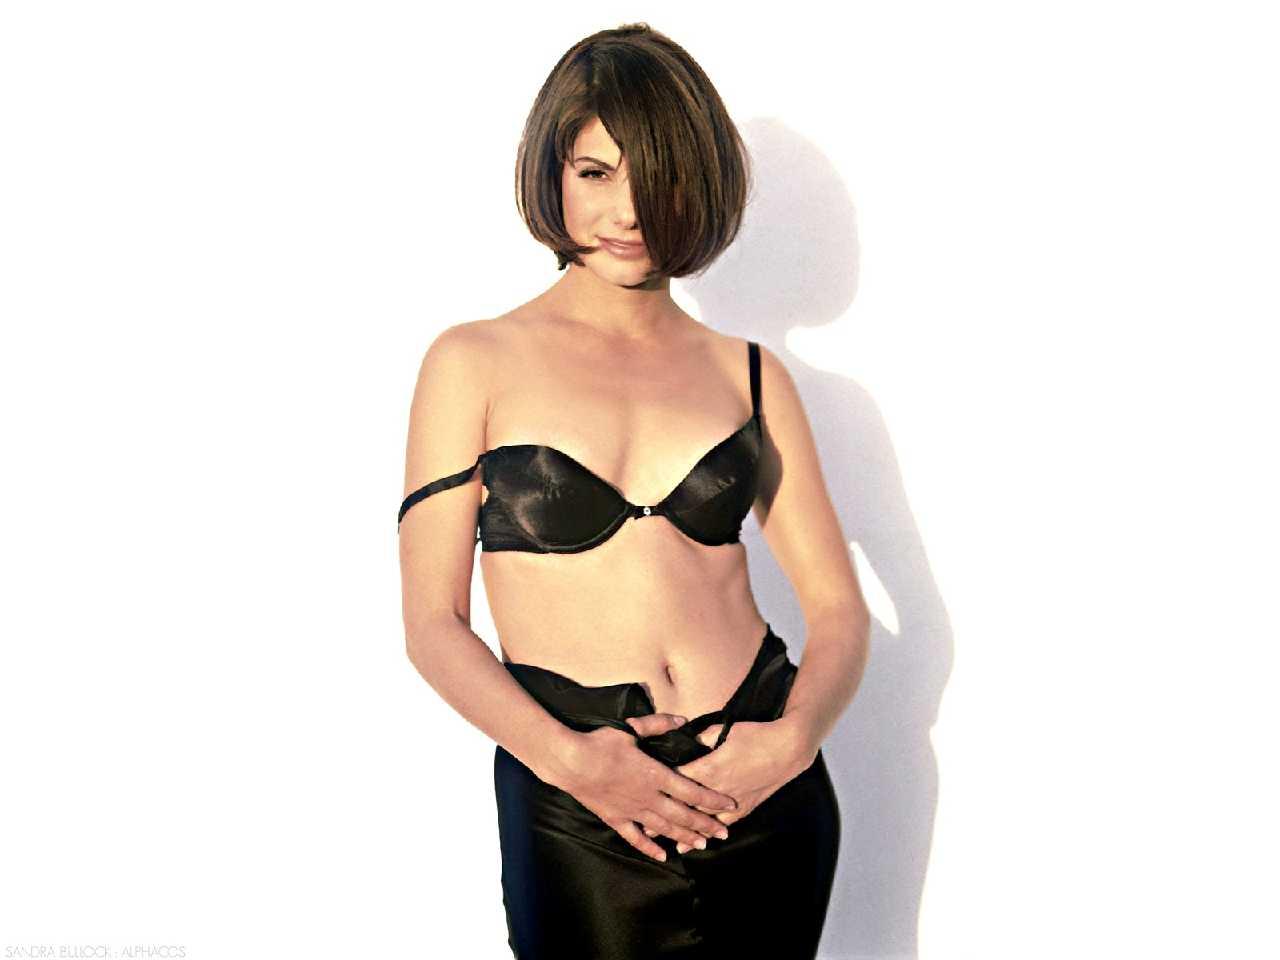 http://1.bp.blogspot.com/-OK7BpcBDzPo/T1wi-9Ogg9I/AAAAAAABDt0/0byMGorf83M/s1600/Sandra+Bullock+Bikini+Butt+&+Ass+Pics+Collection+21.jpg